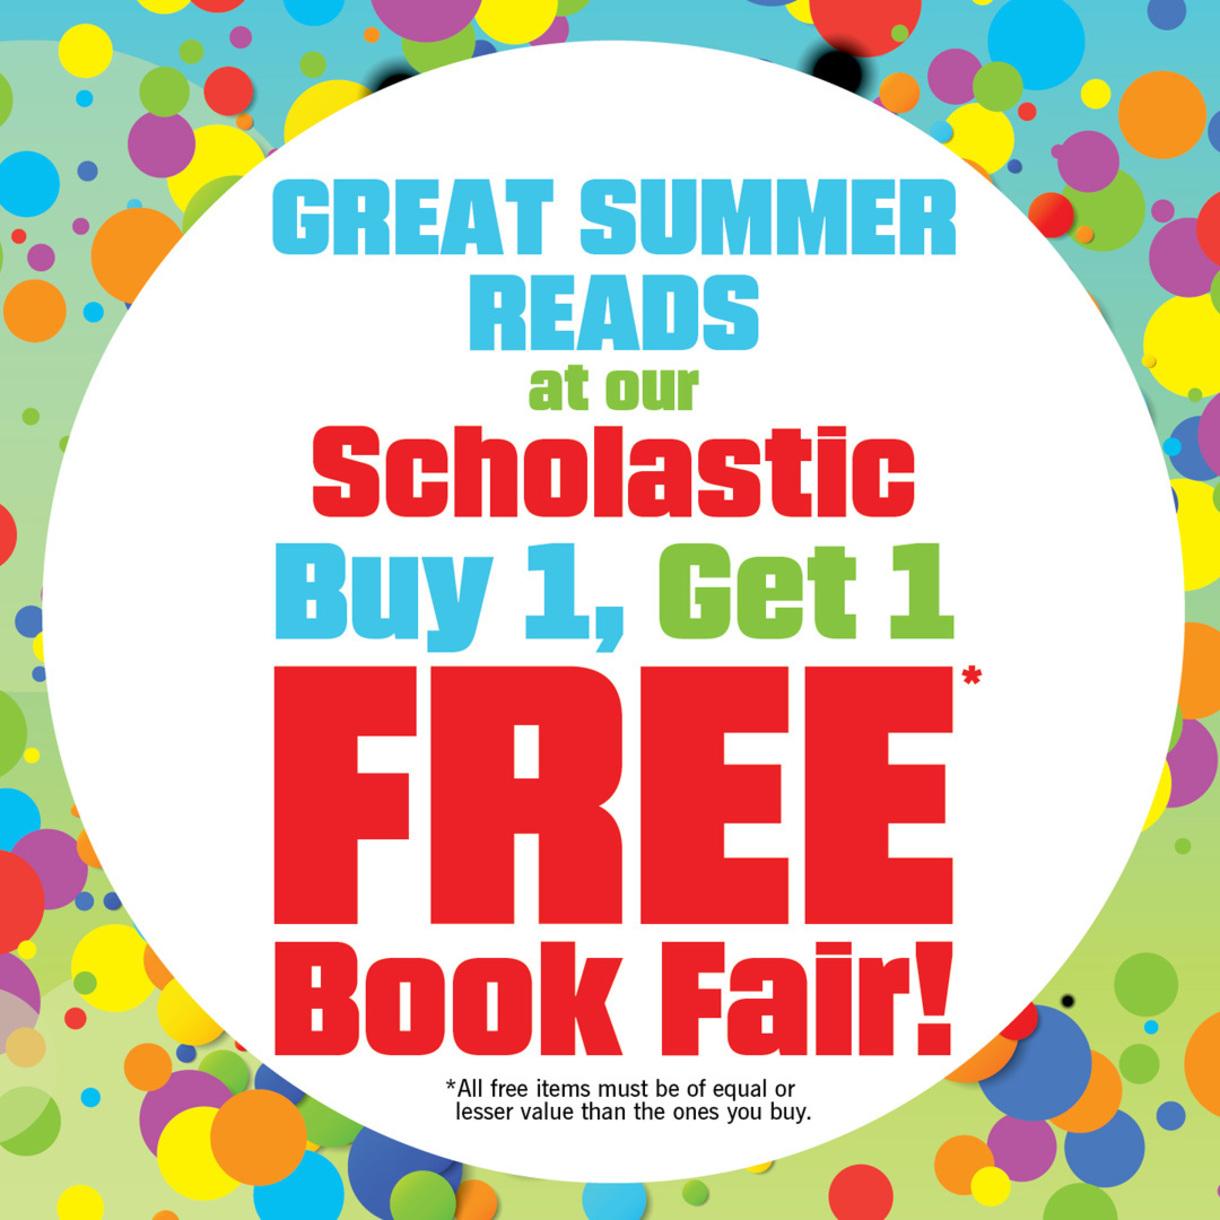 Book Fair BOGO